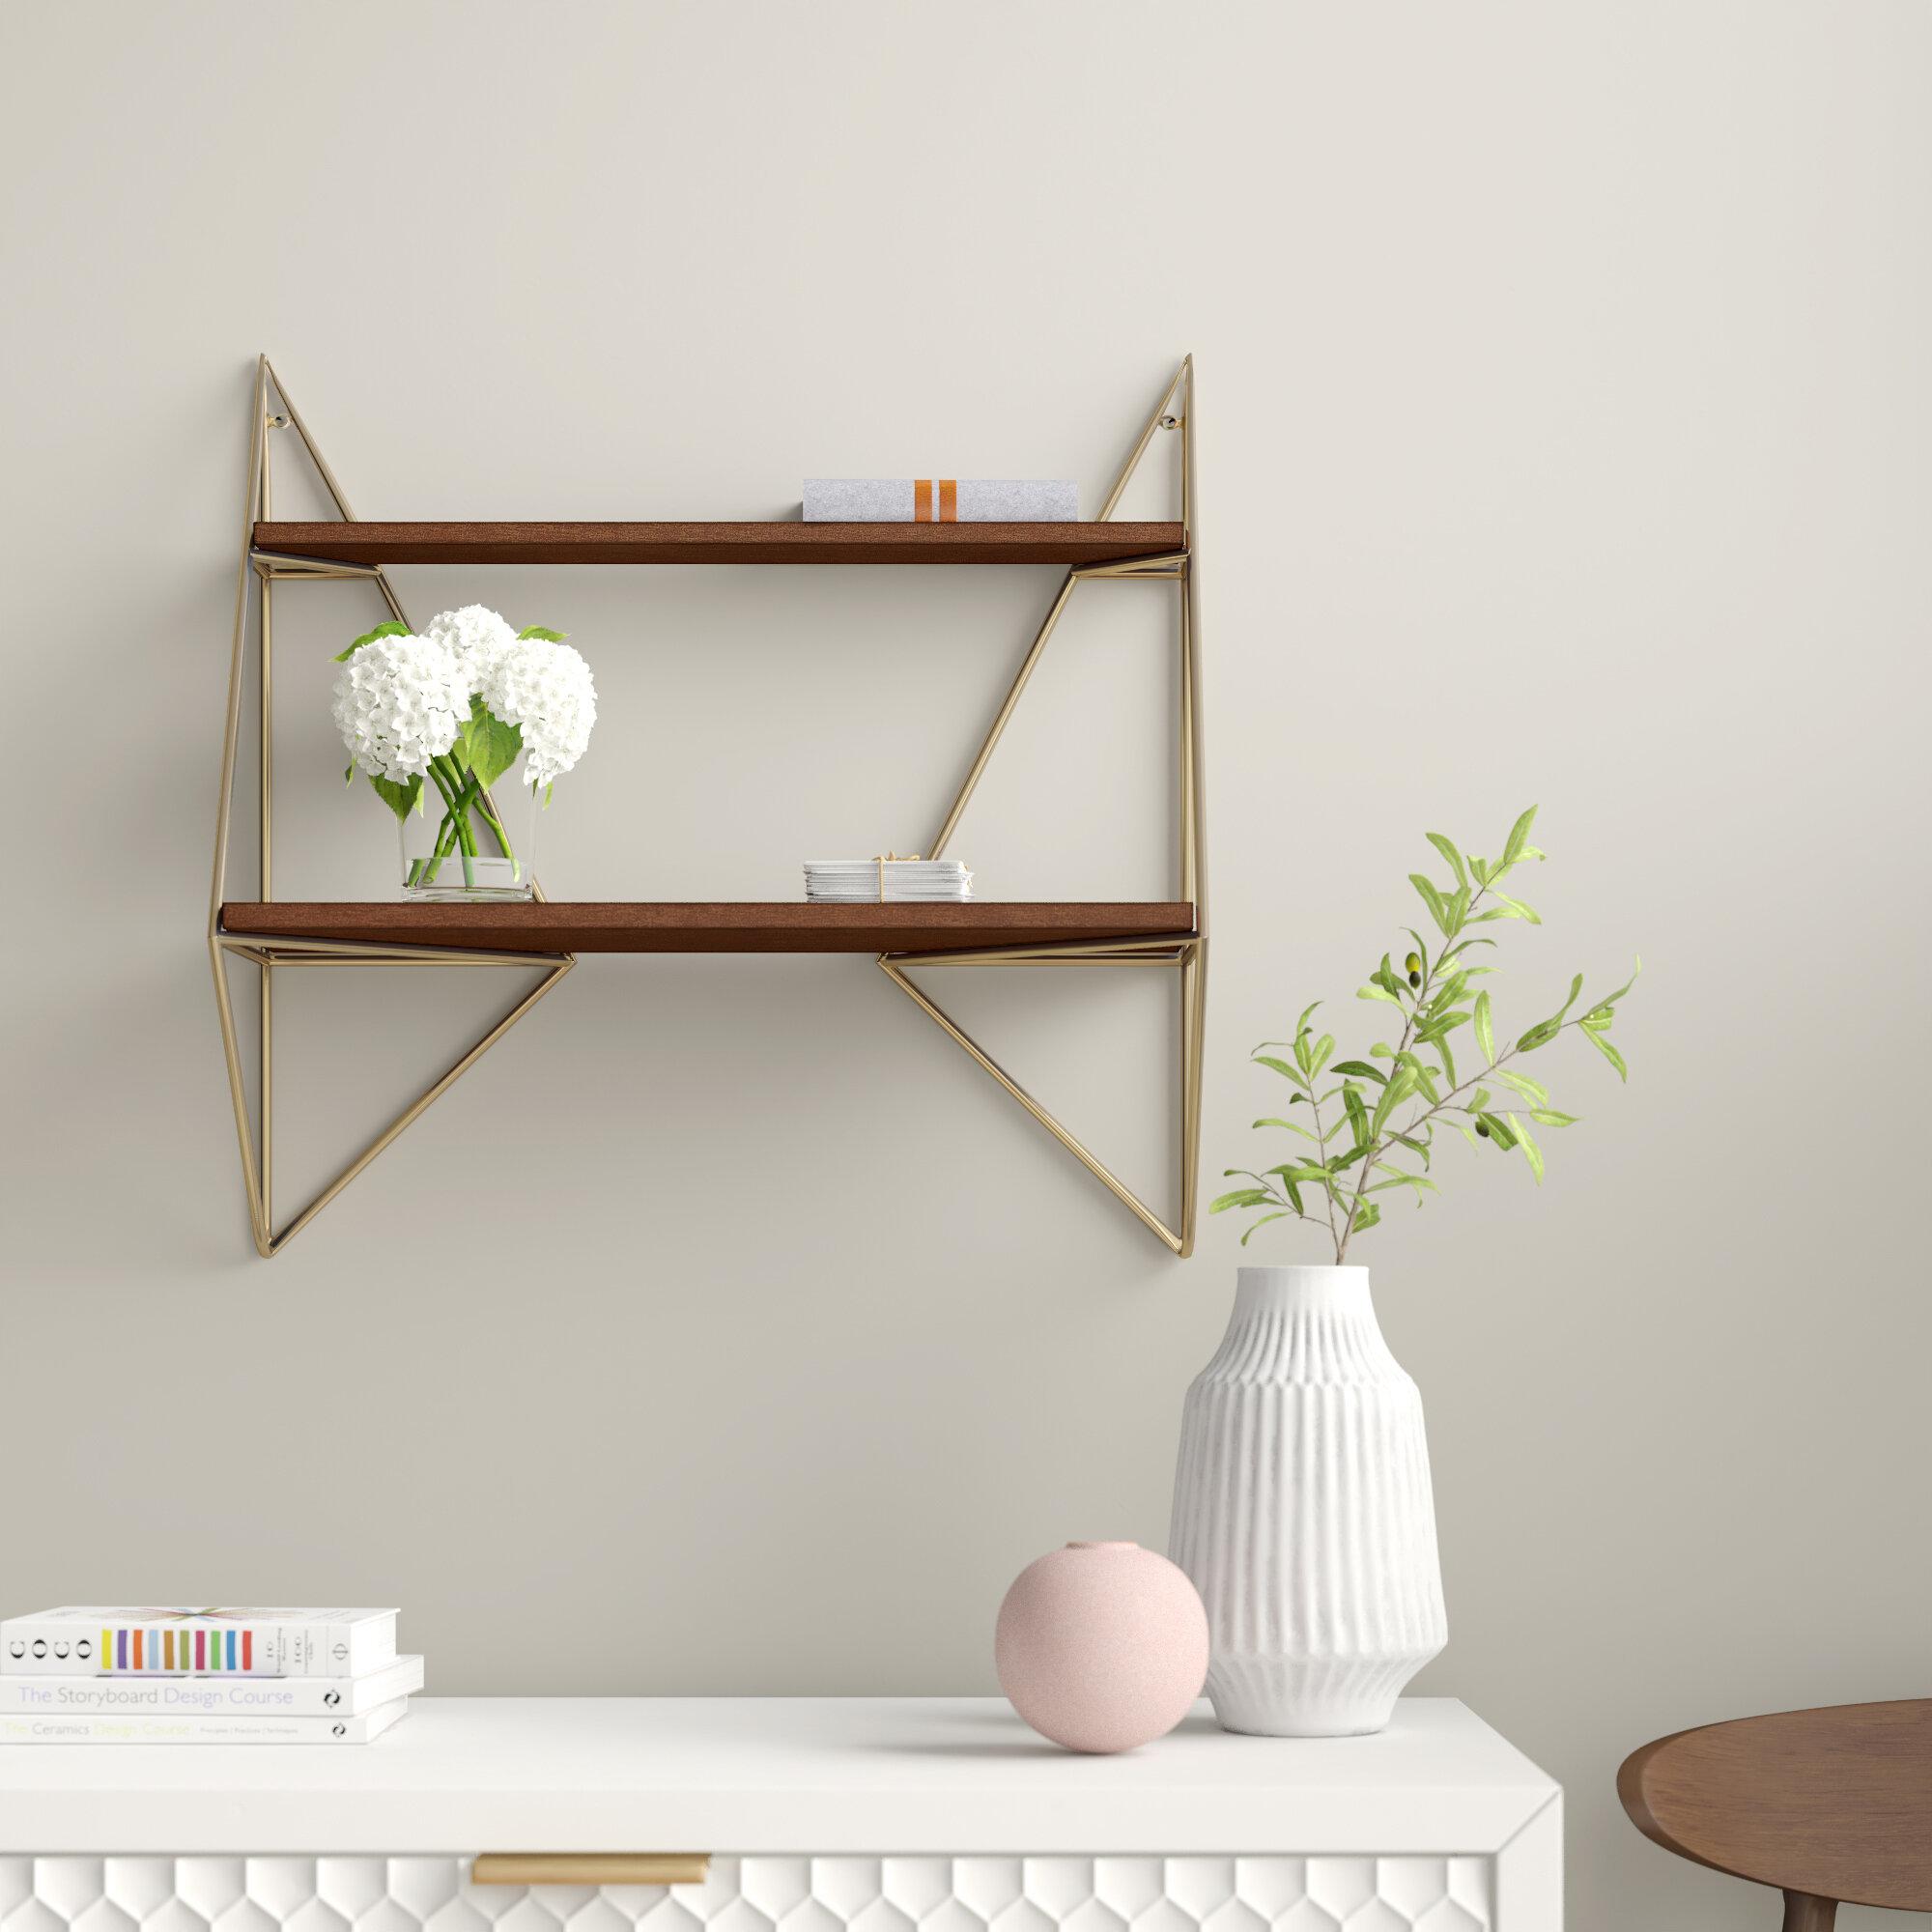 Elsie Decorative Mid Century Modern Wall Shelf